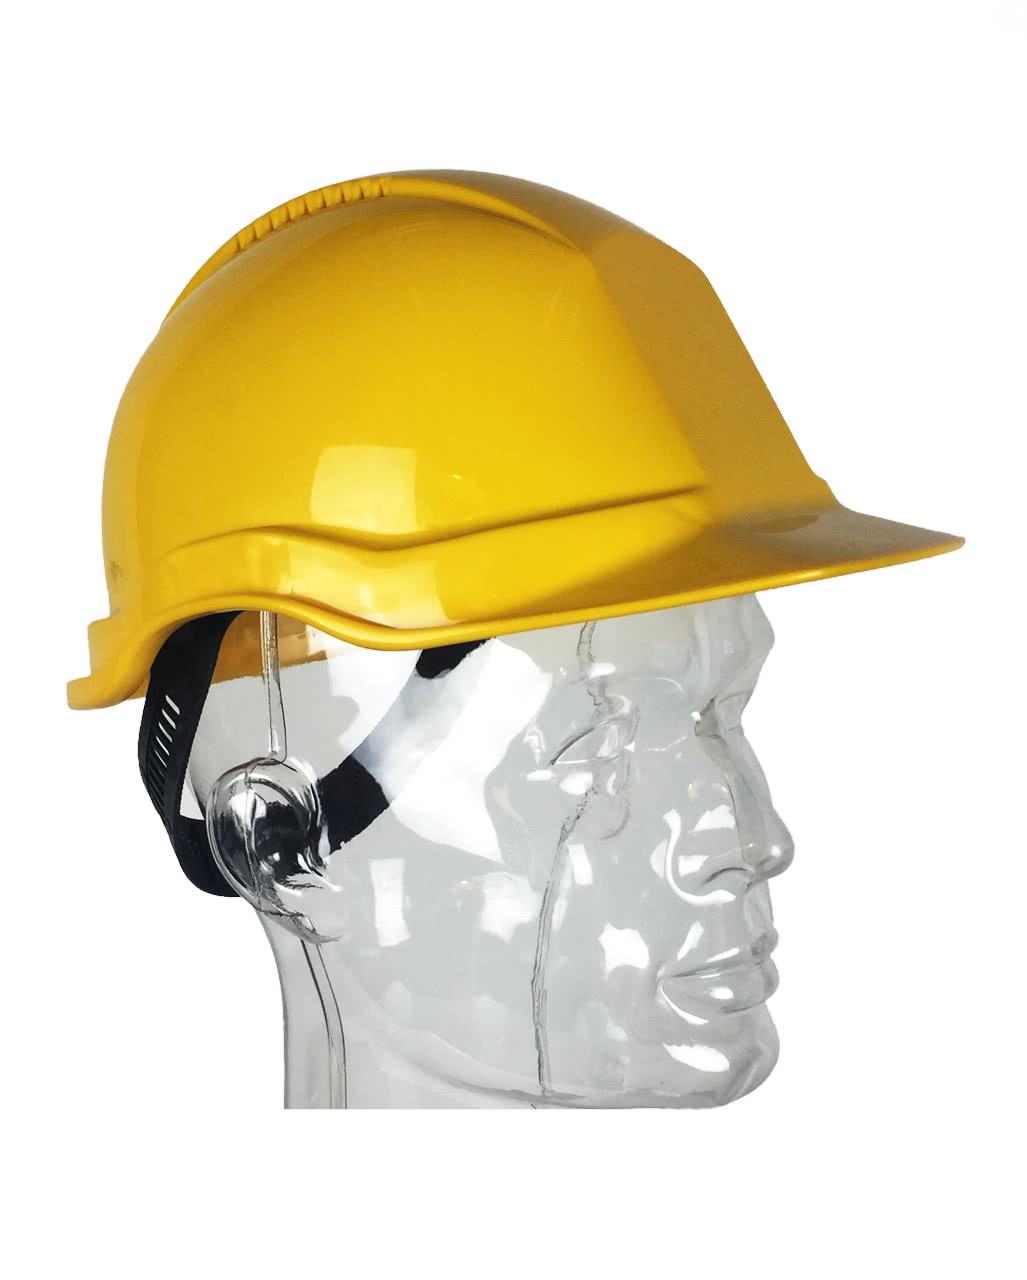 Bauarbeiterhelm Gelb Bauarbeiteraccessoire Karneval Universe